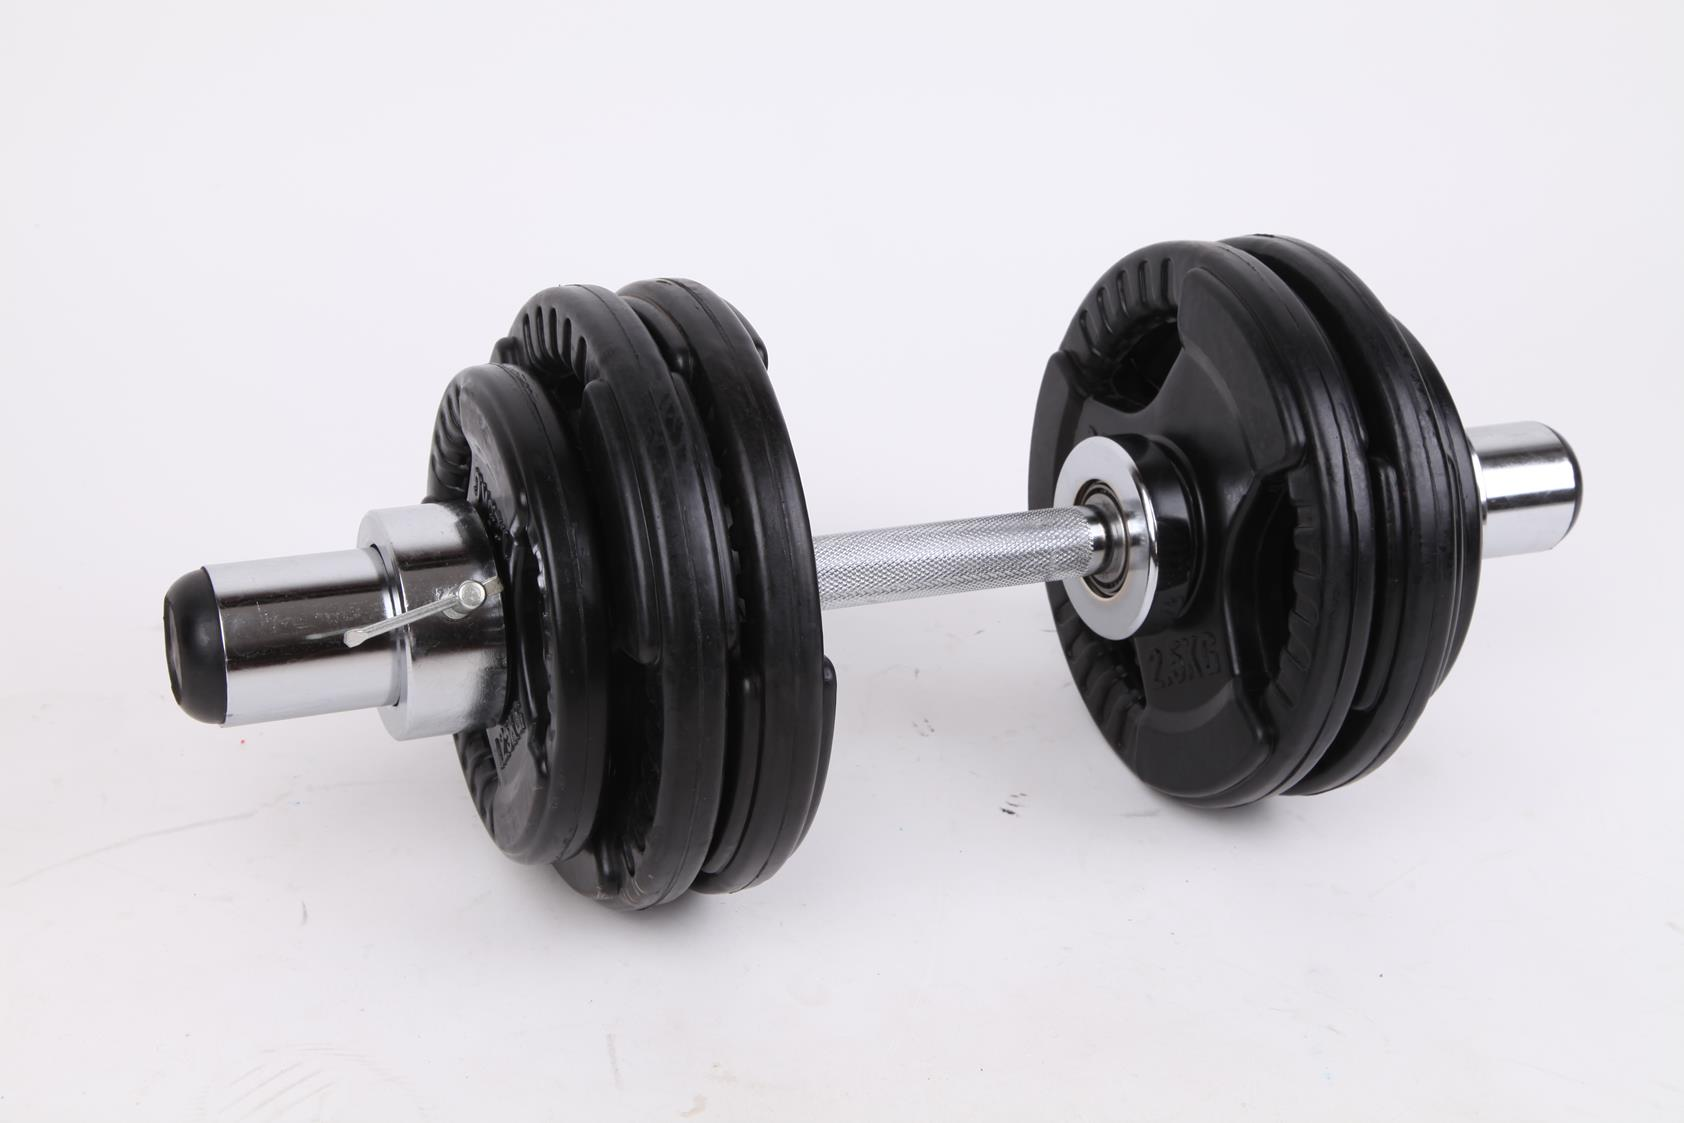 Olympic Dumbell Handles Pair Bearings Weight Bars  Z2369